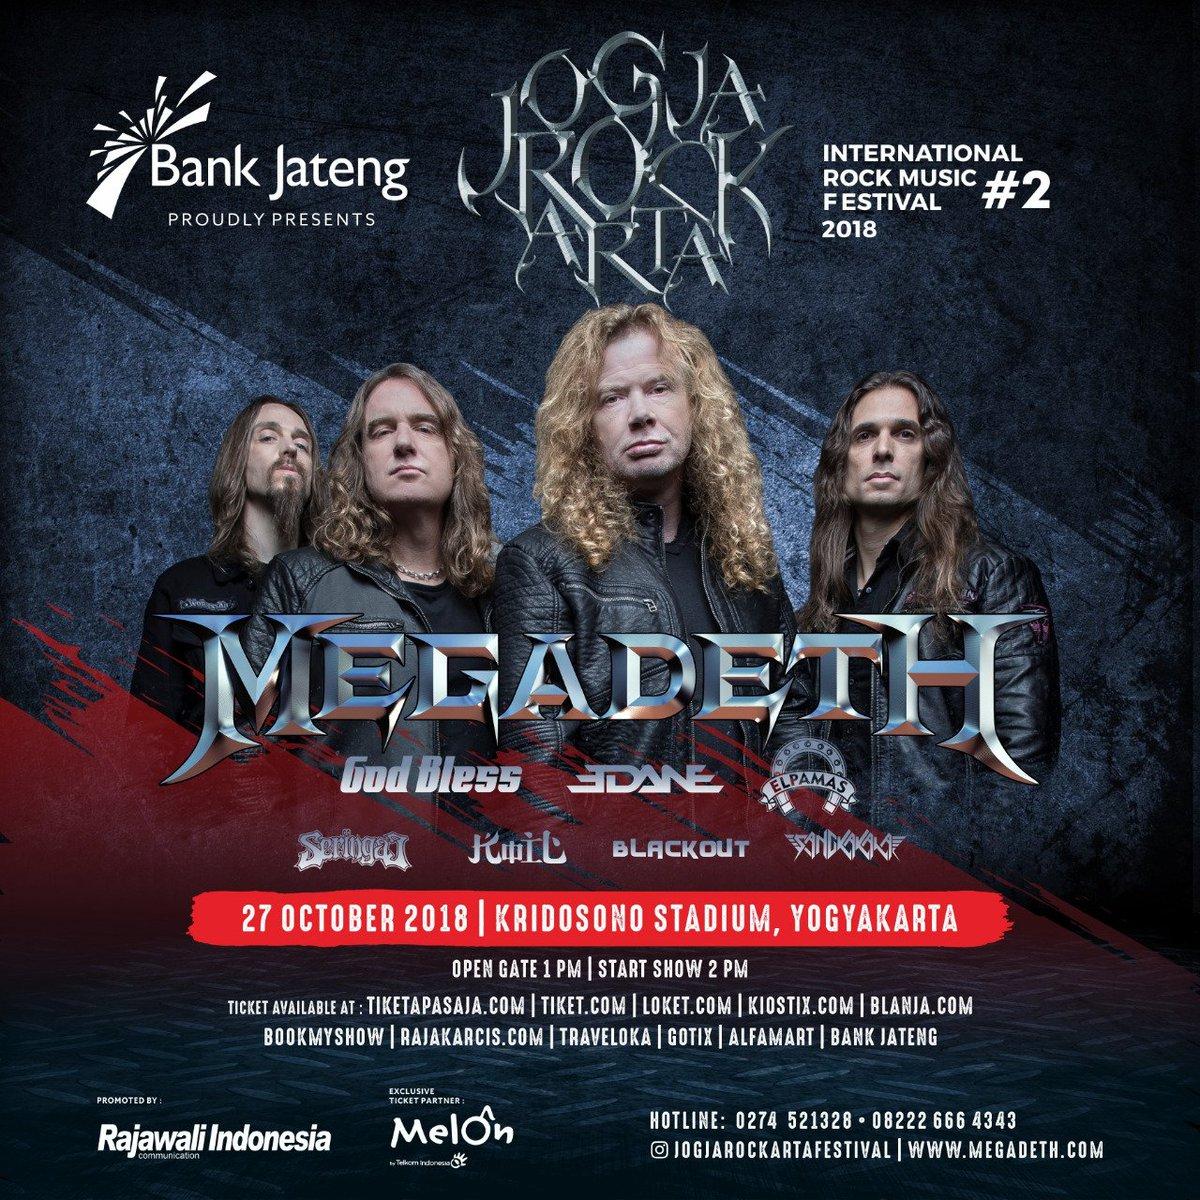 Konser Megadeth 27 Oktober 2018 (via twitter @jogjaROCKarta